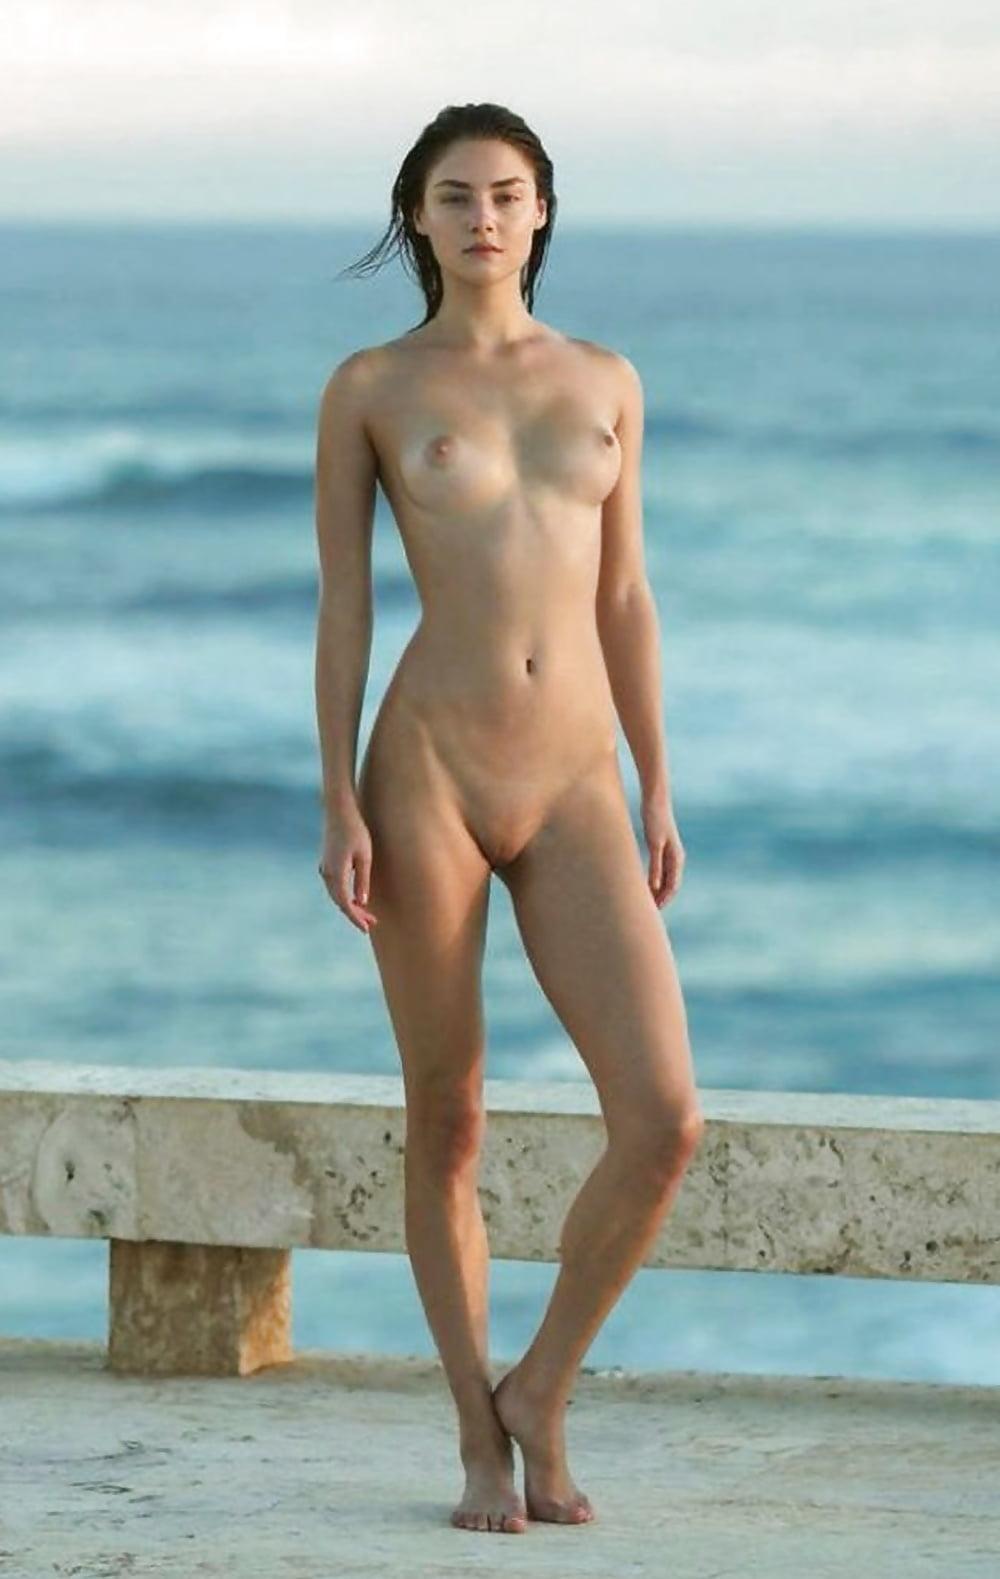 Vika Levina Nude July 2017 10 Pics | CLOUDY GIRL PICS